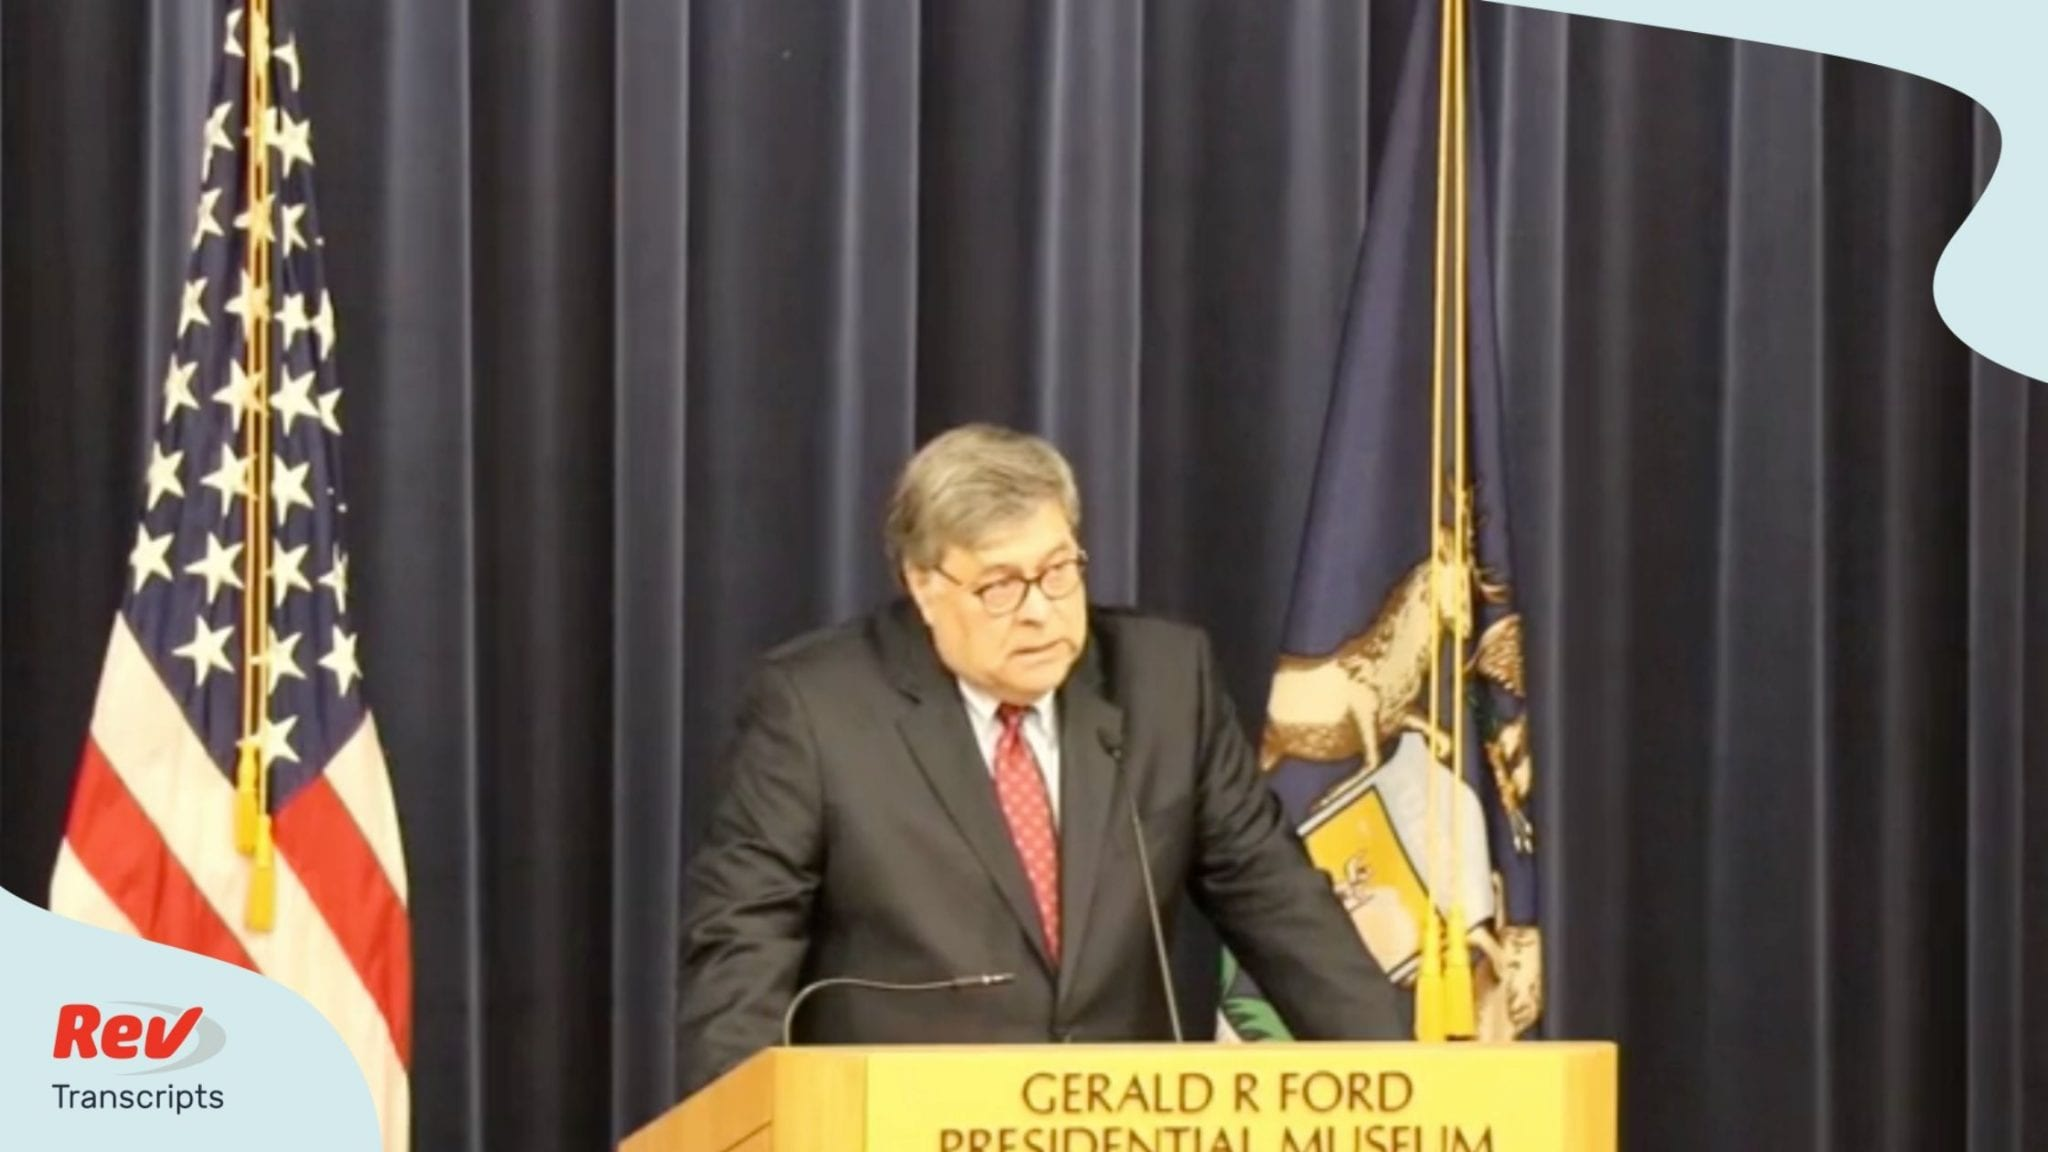 William Barr gave a speech July 16